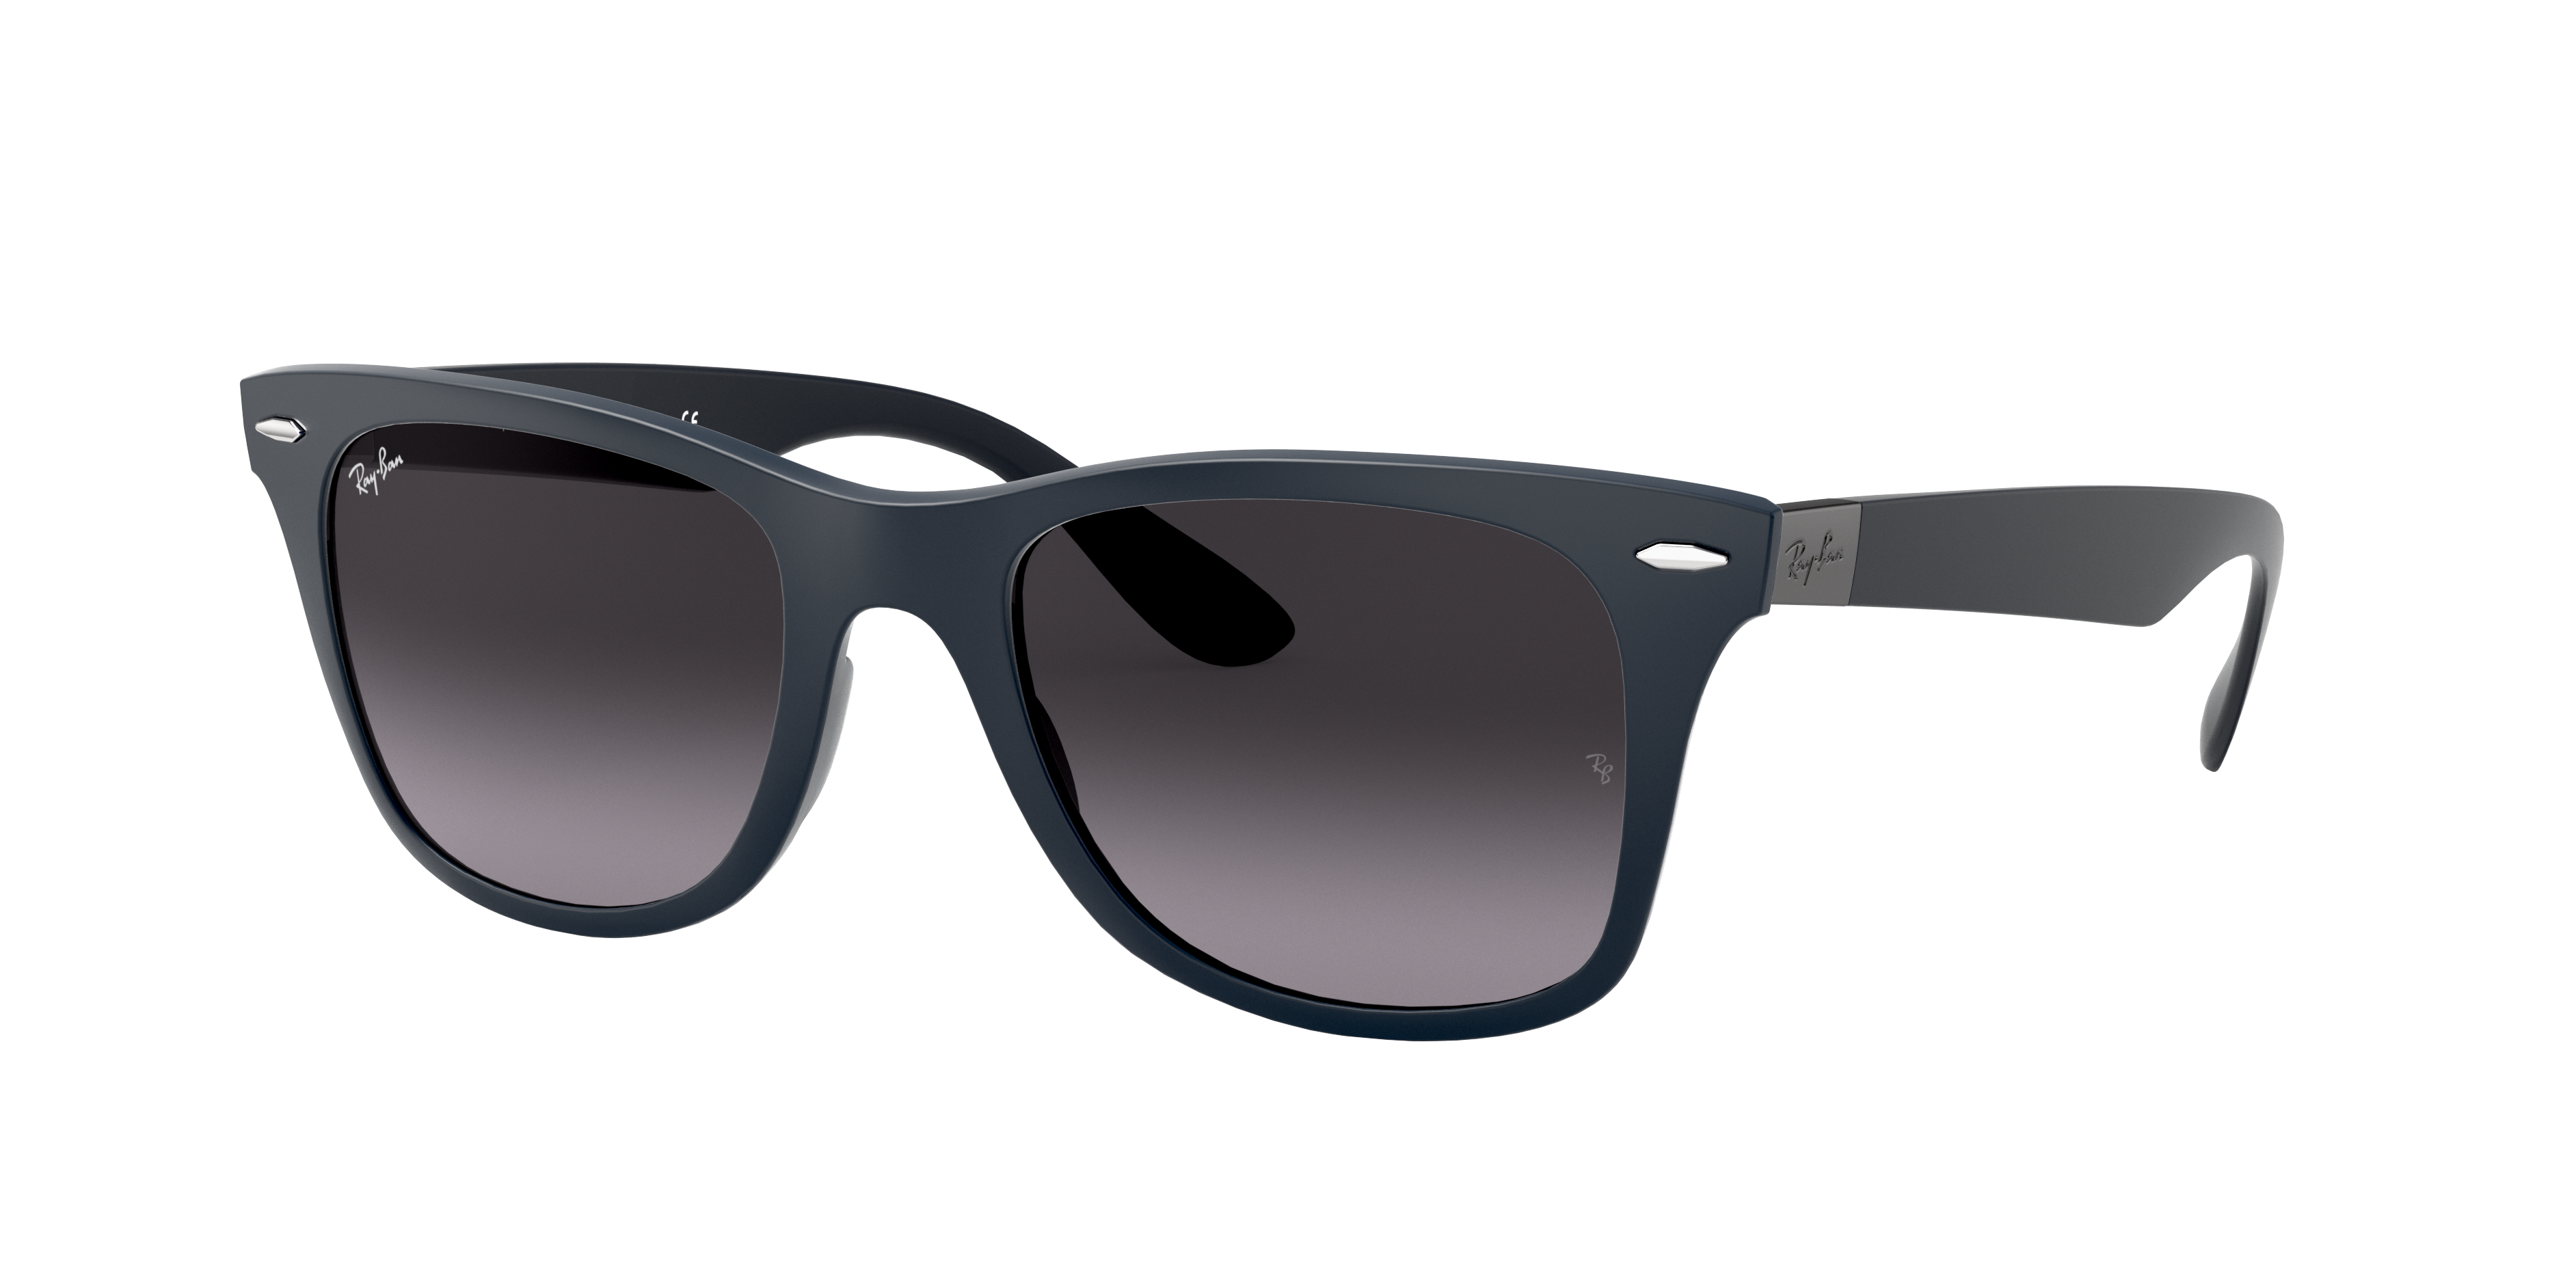 Ray-Ban Wayfarer Liteforce Blue, Gray Lenses - RB4195